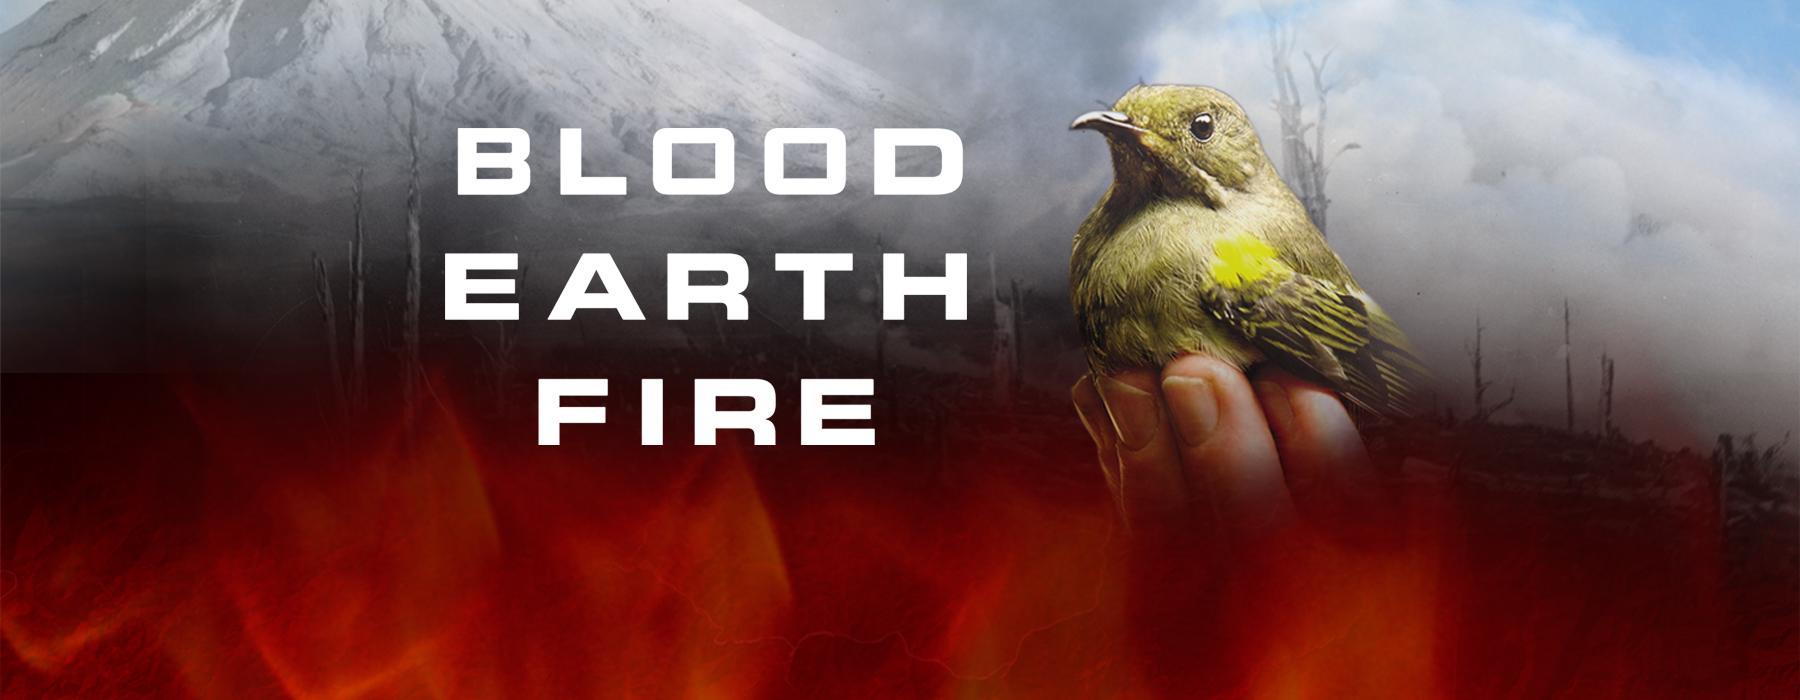 Bird, mountain and fire